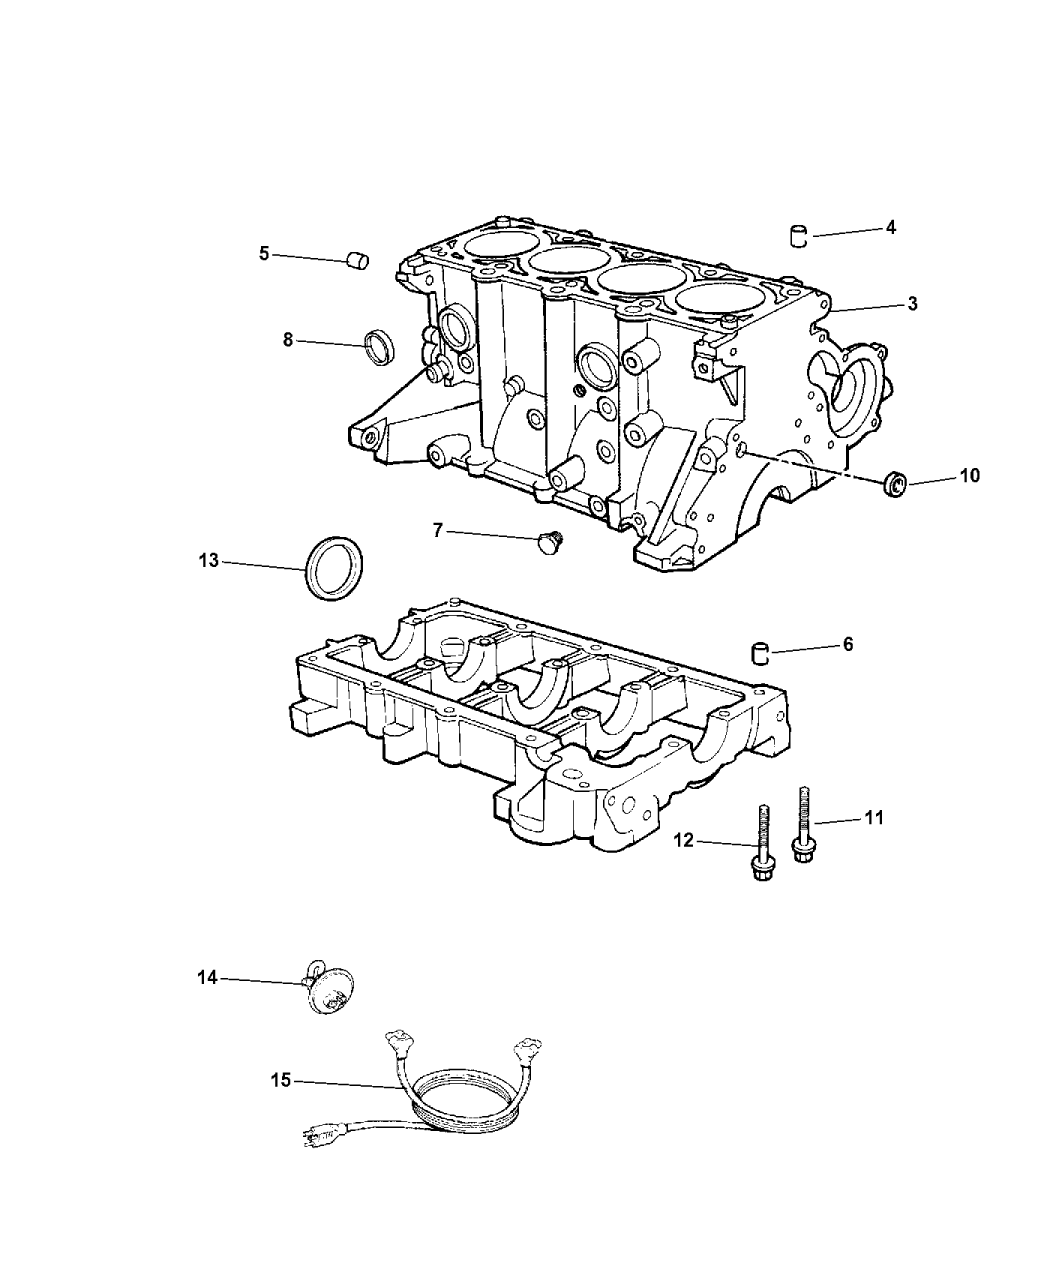 2003 Chrysler PT Cruiser Cylinder Block & Related Parts